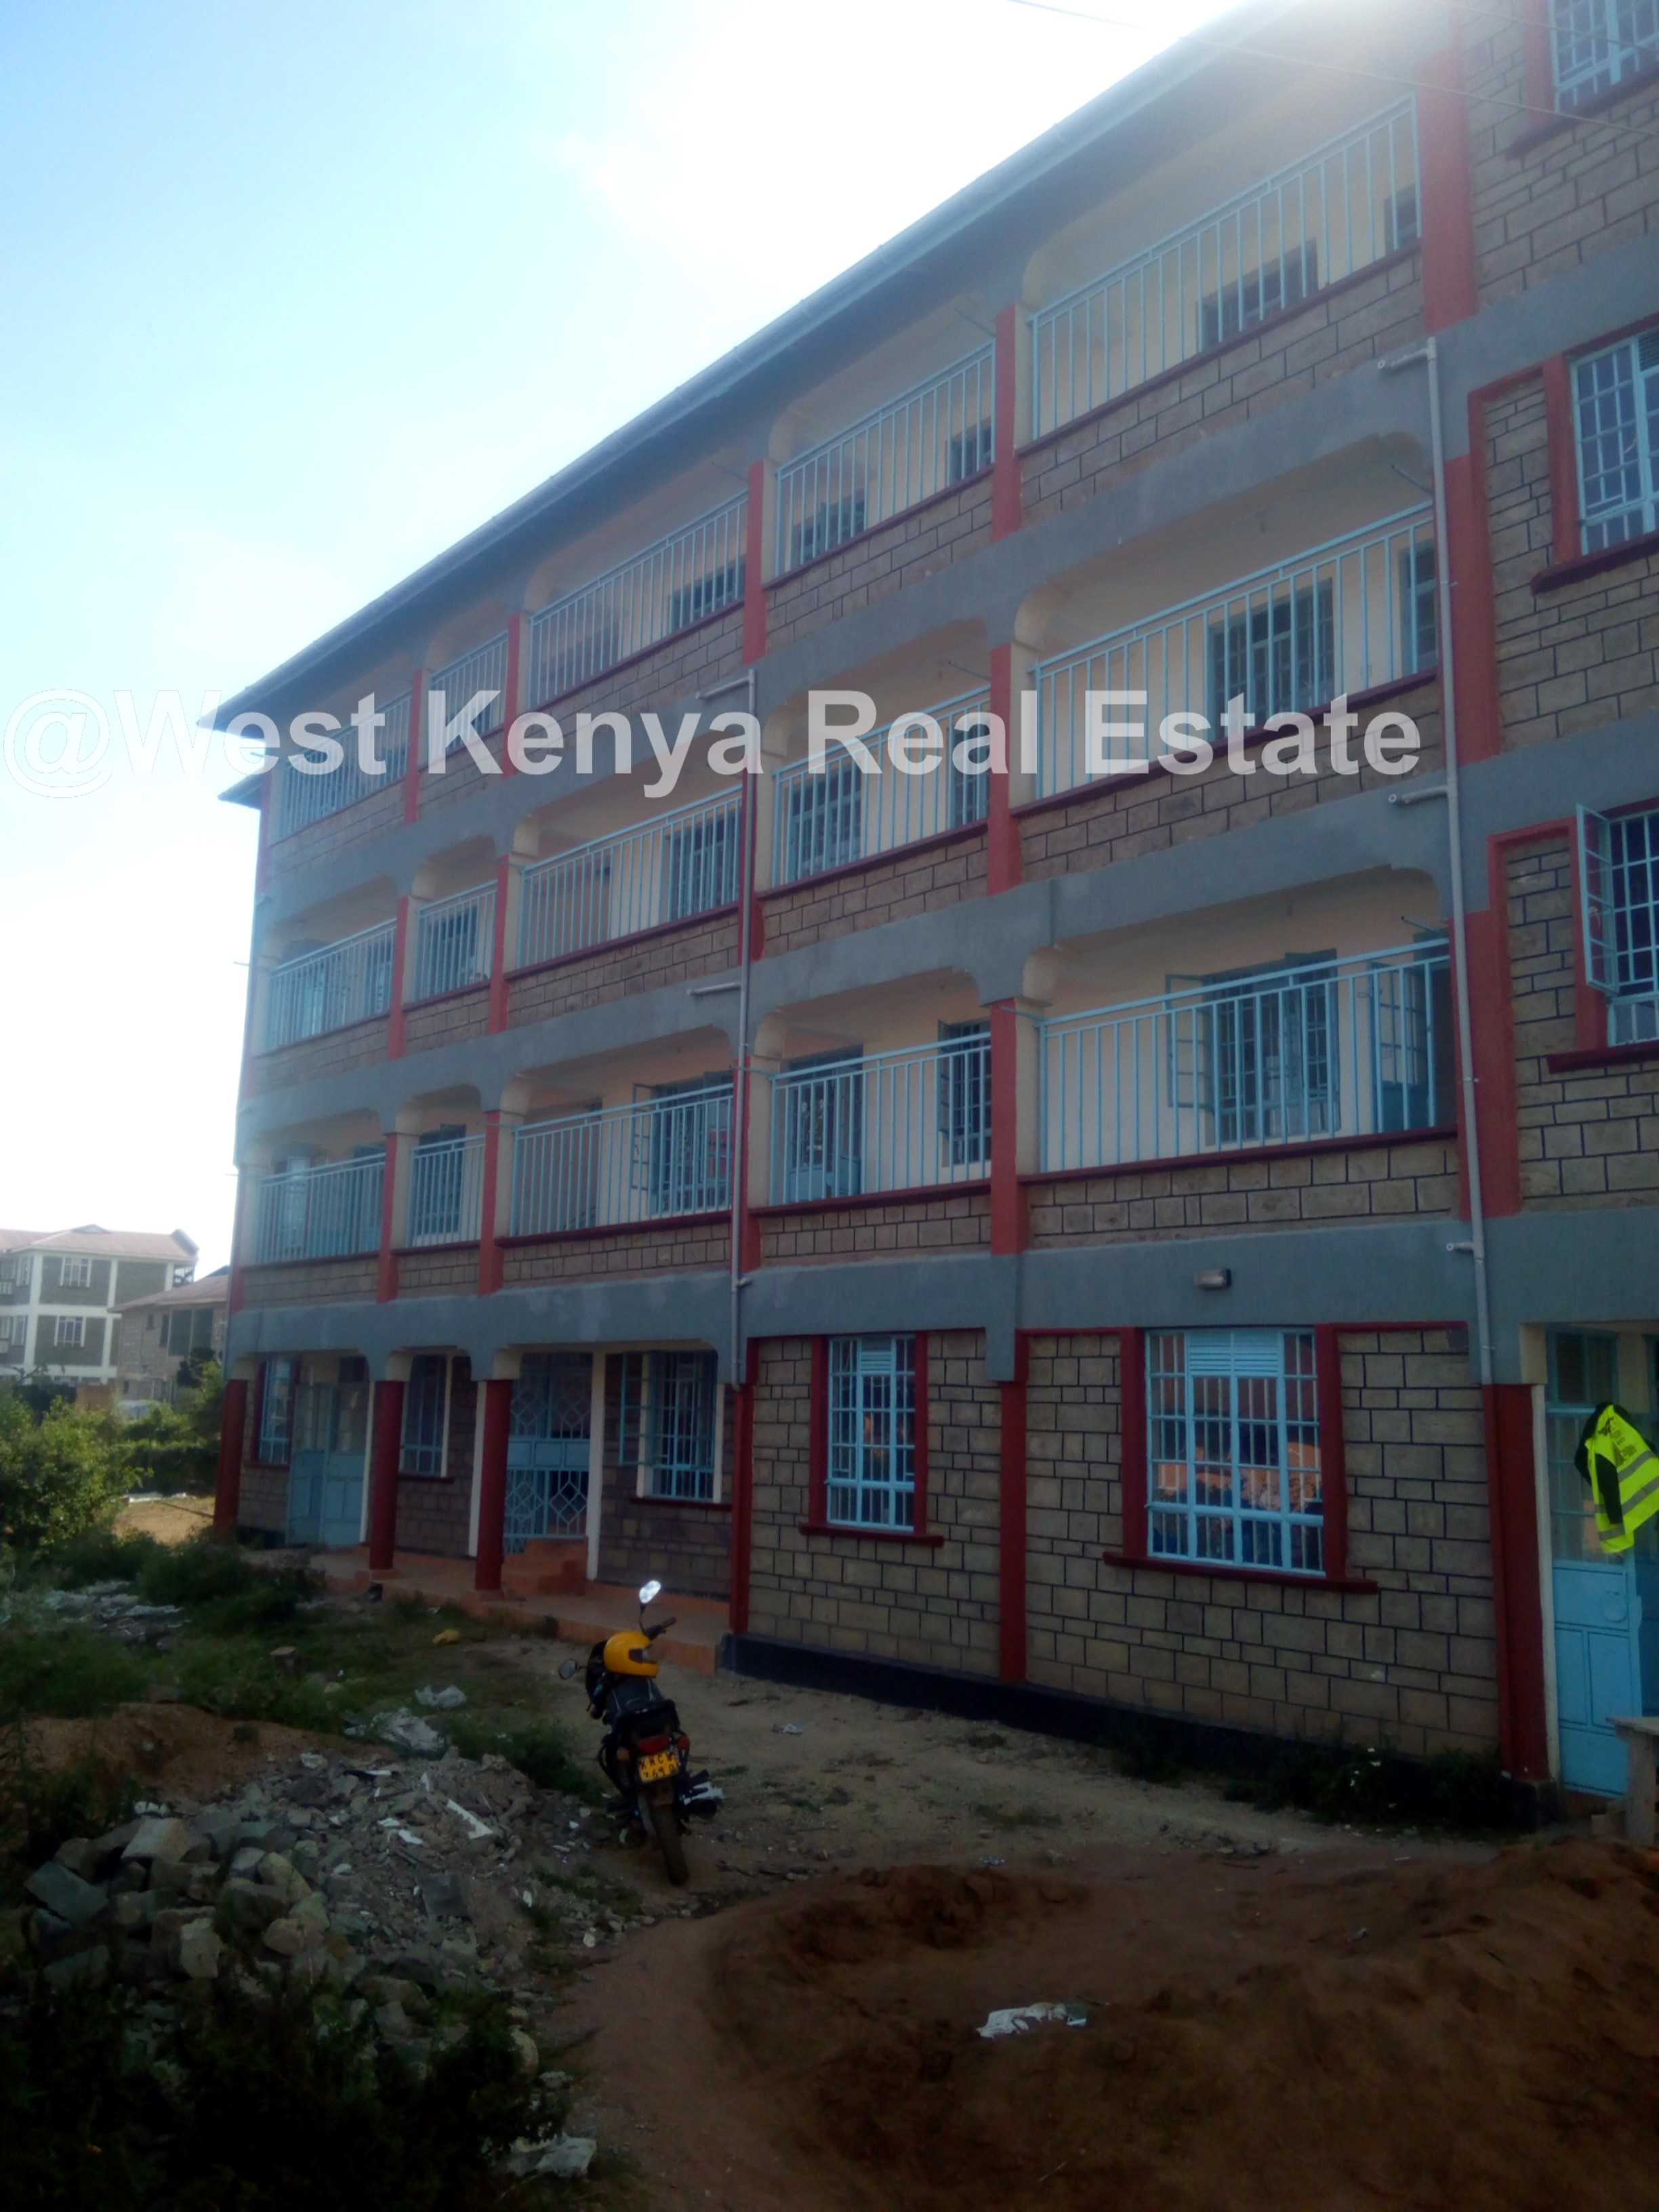 Chavakali house renovation services,Property management Mbale, Mbale property management, property management in Mbale, Mbale property manager, apartment management in Mbale, Mbale apartment management, apartment management in Mbale, Mbale apartment manager